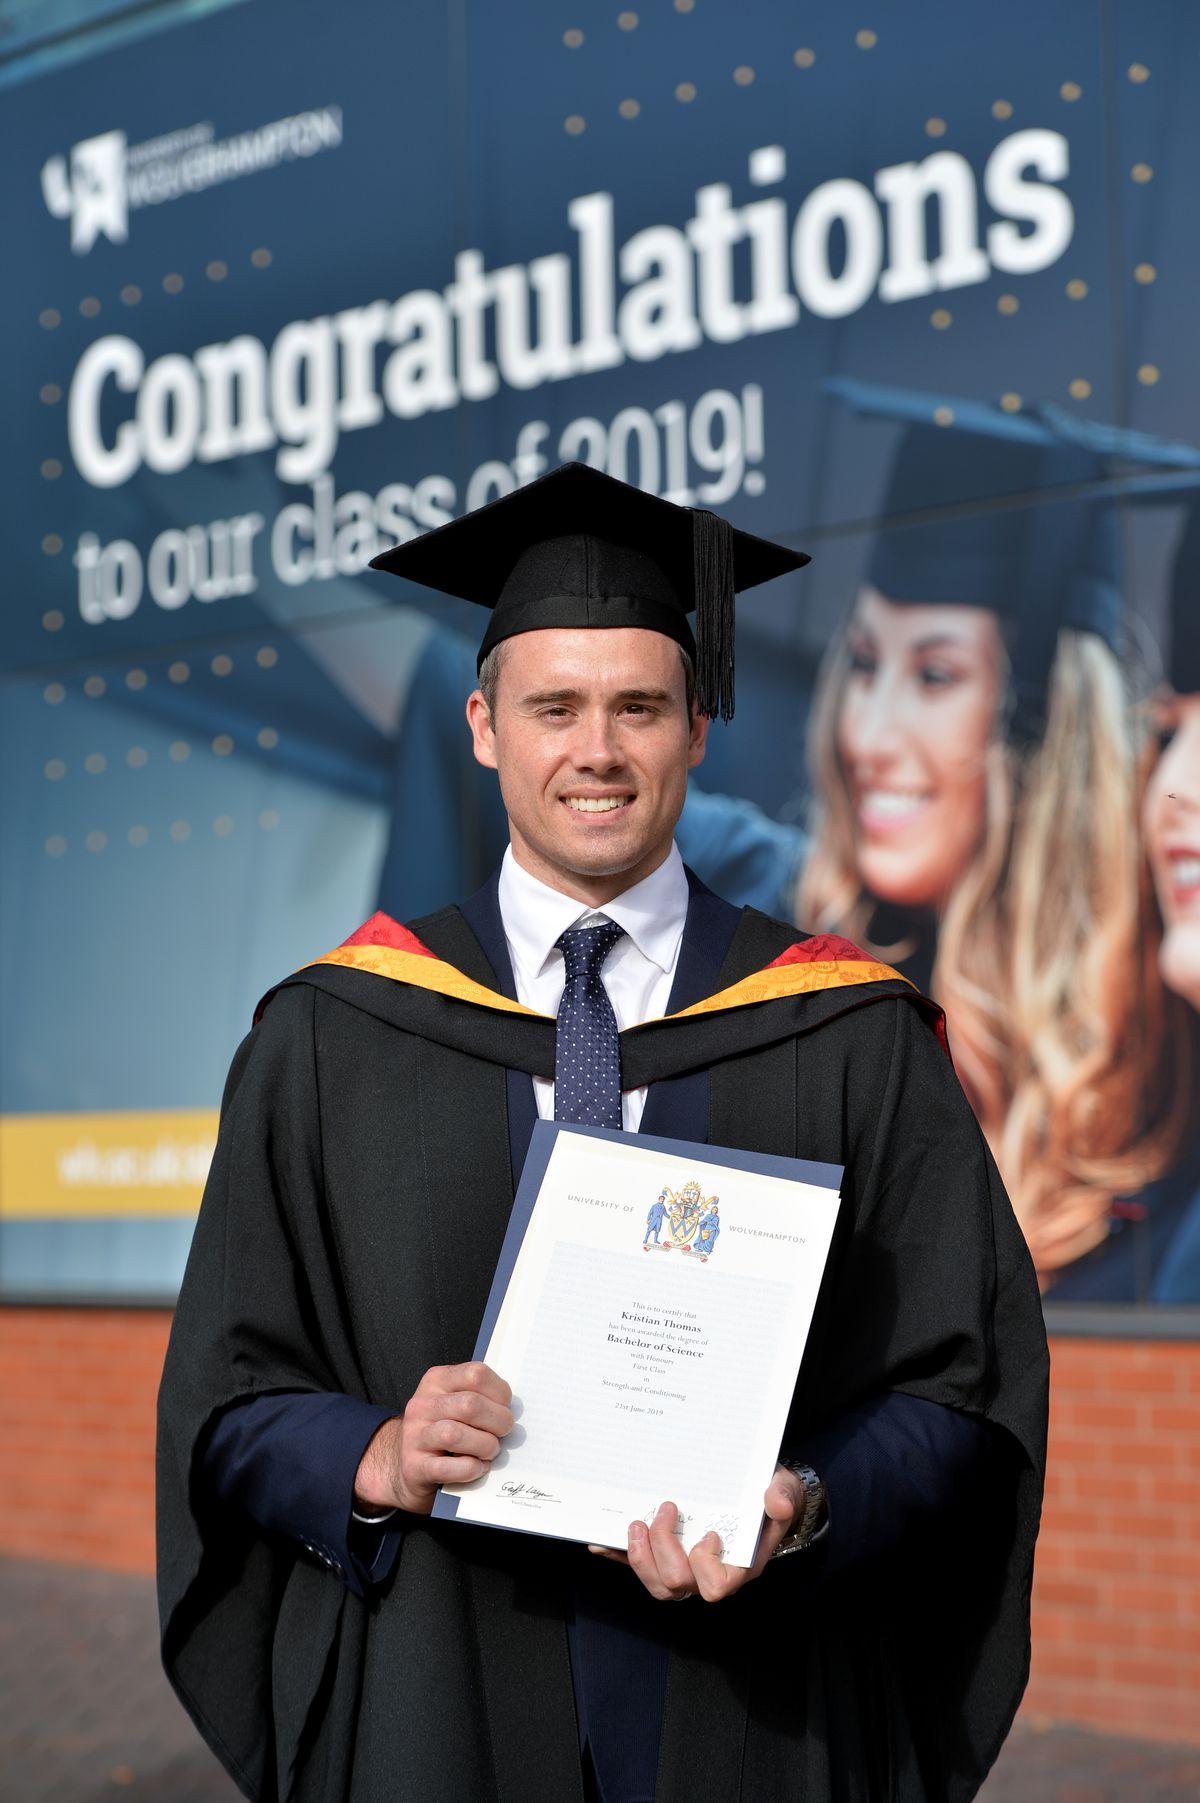 Kristian Thomas celebrates after receiving his degree